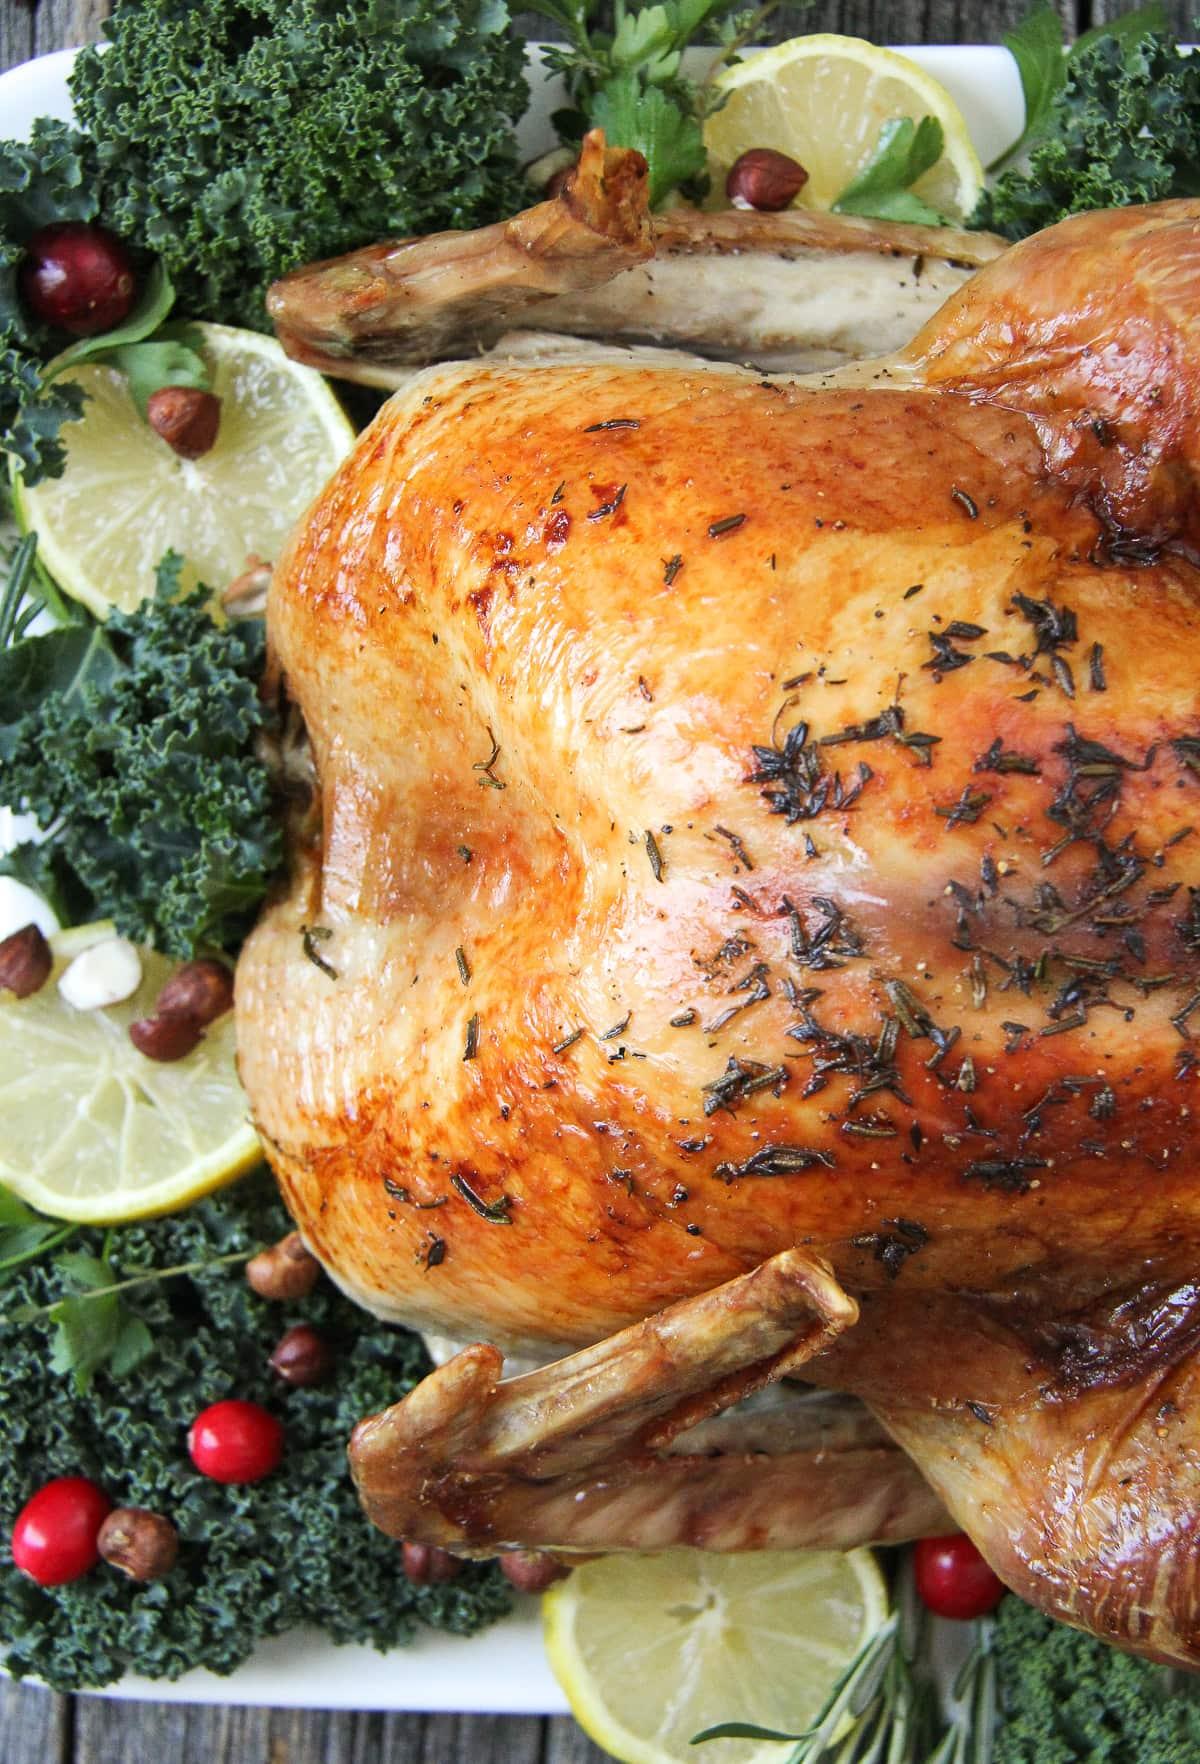 Lemon Rosemary Roasted Turkey